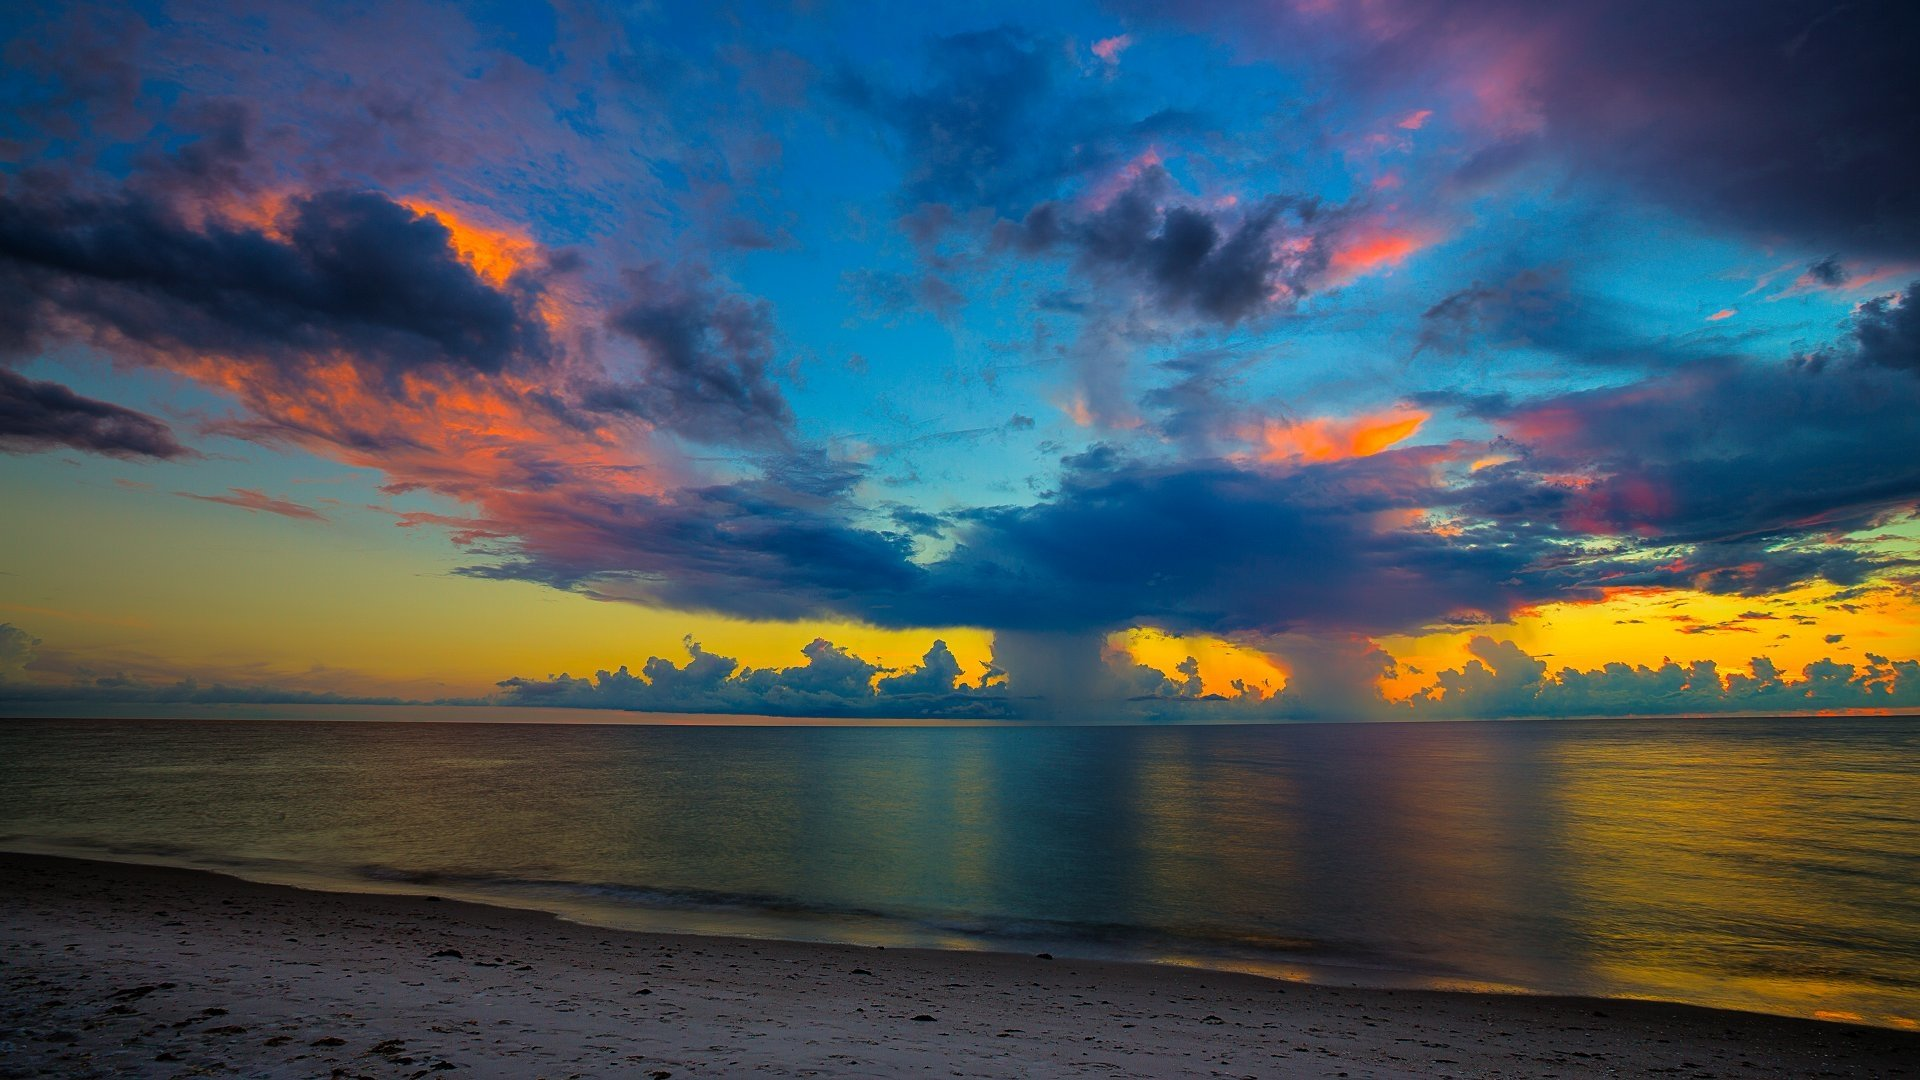 Photo Wallpaper 3d In Tampa Fl Florida Beach Sunset Hd Wallpaper Background Image